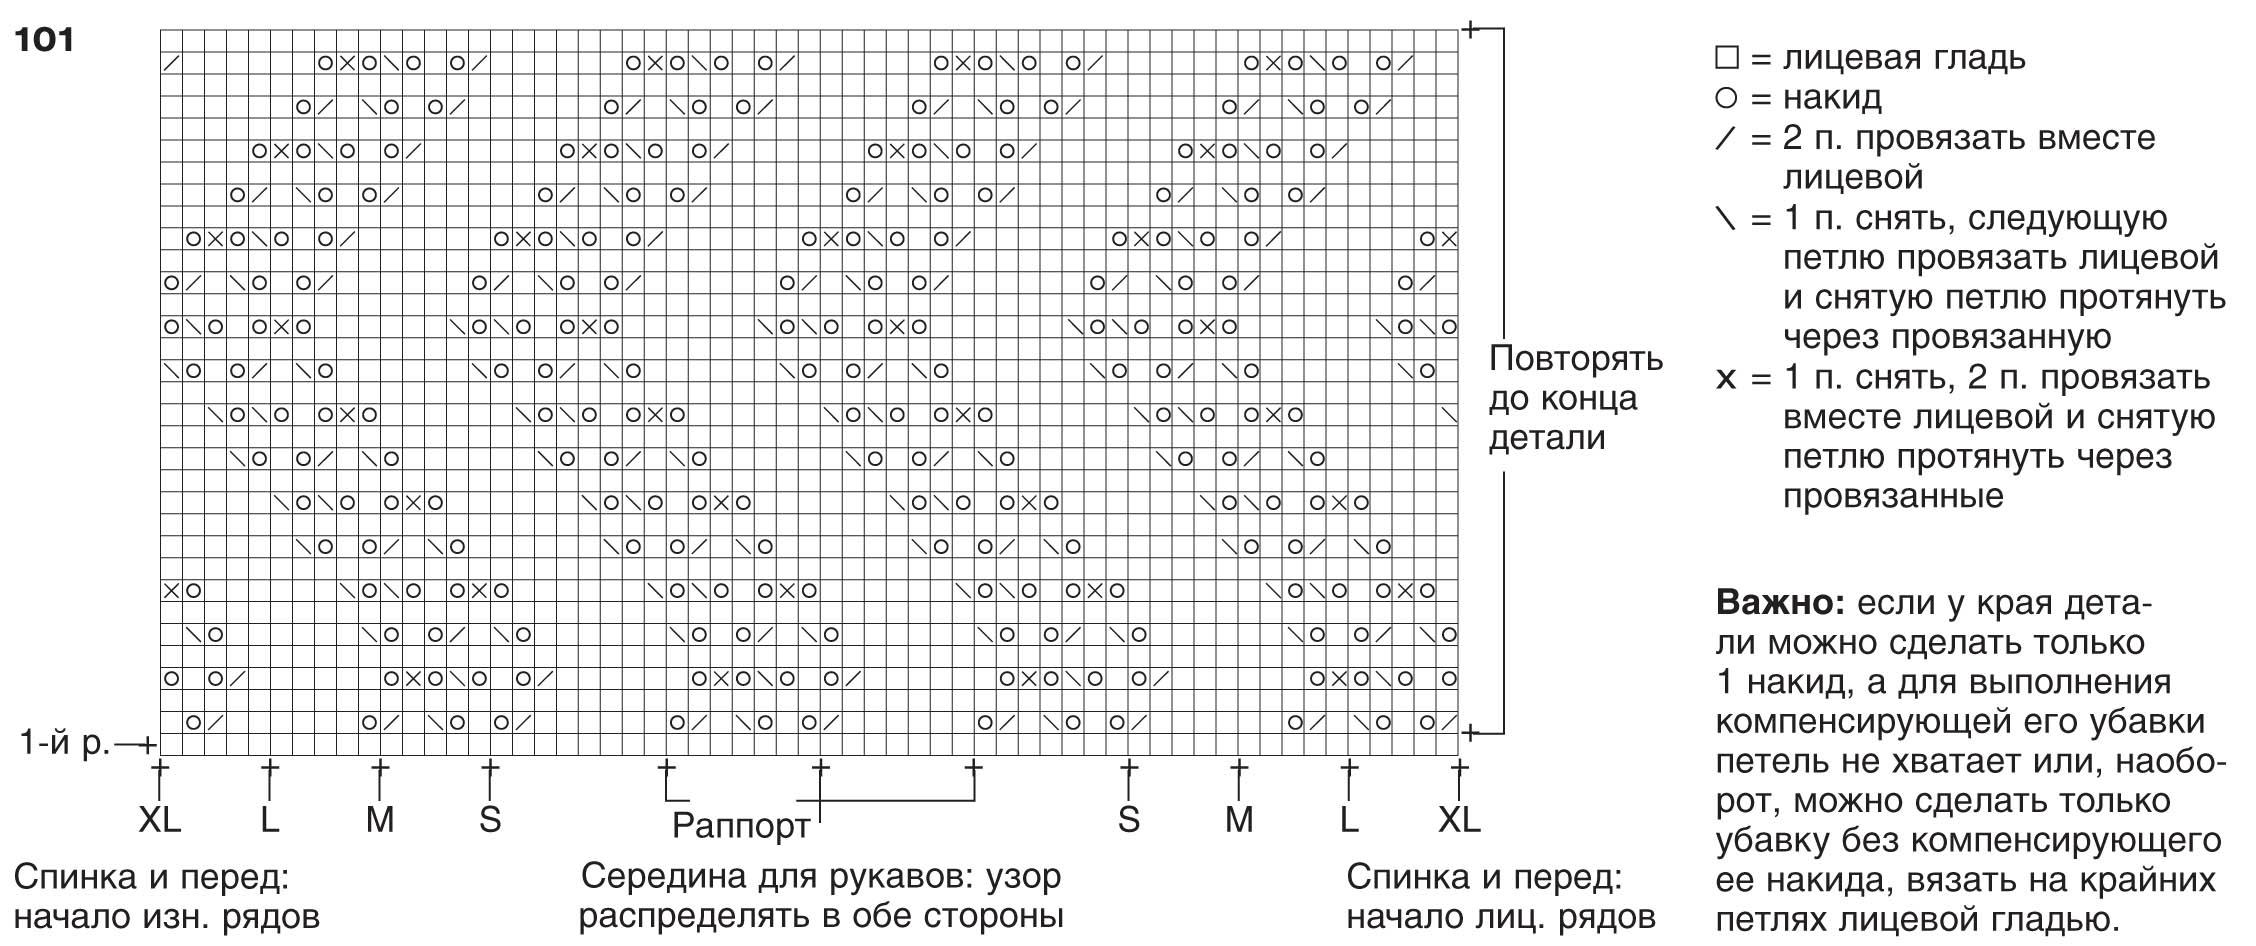 схема узоров спицами зигзага